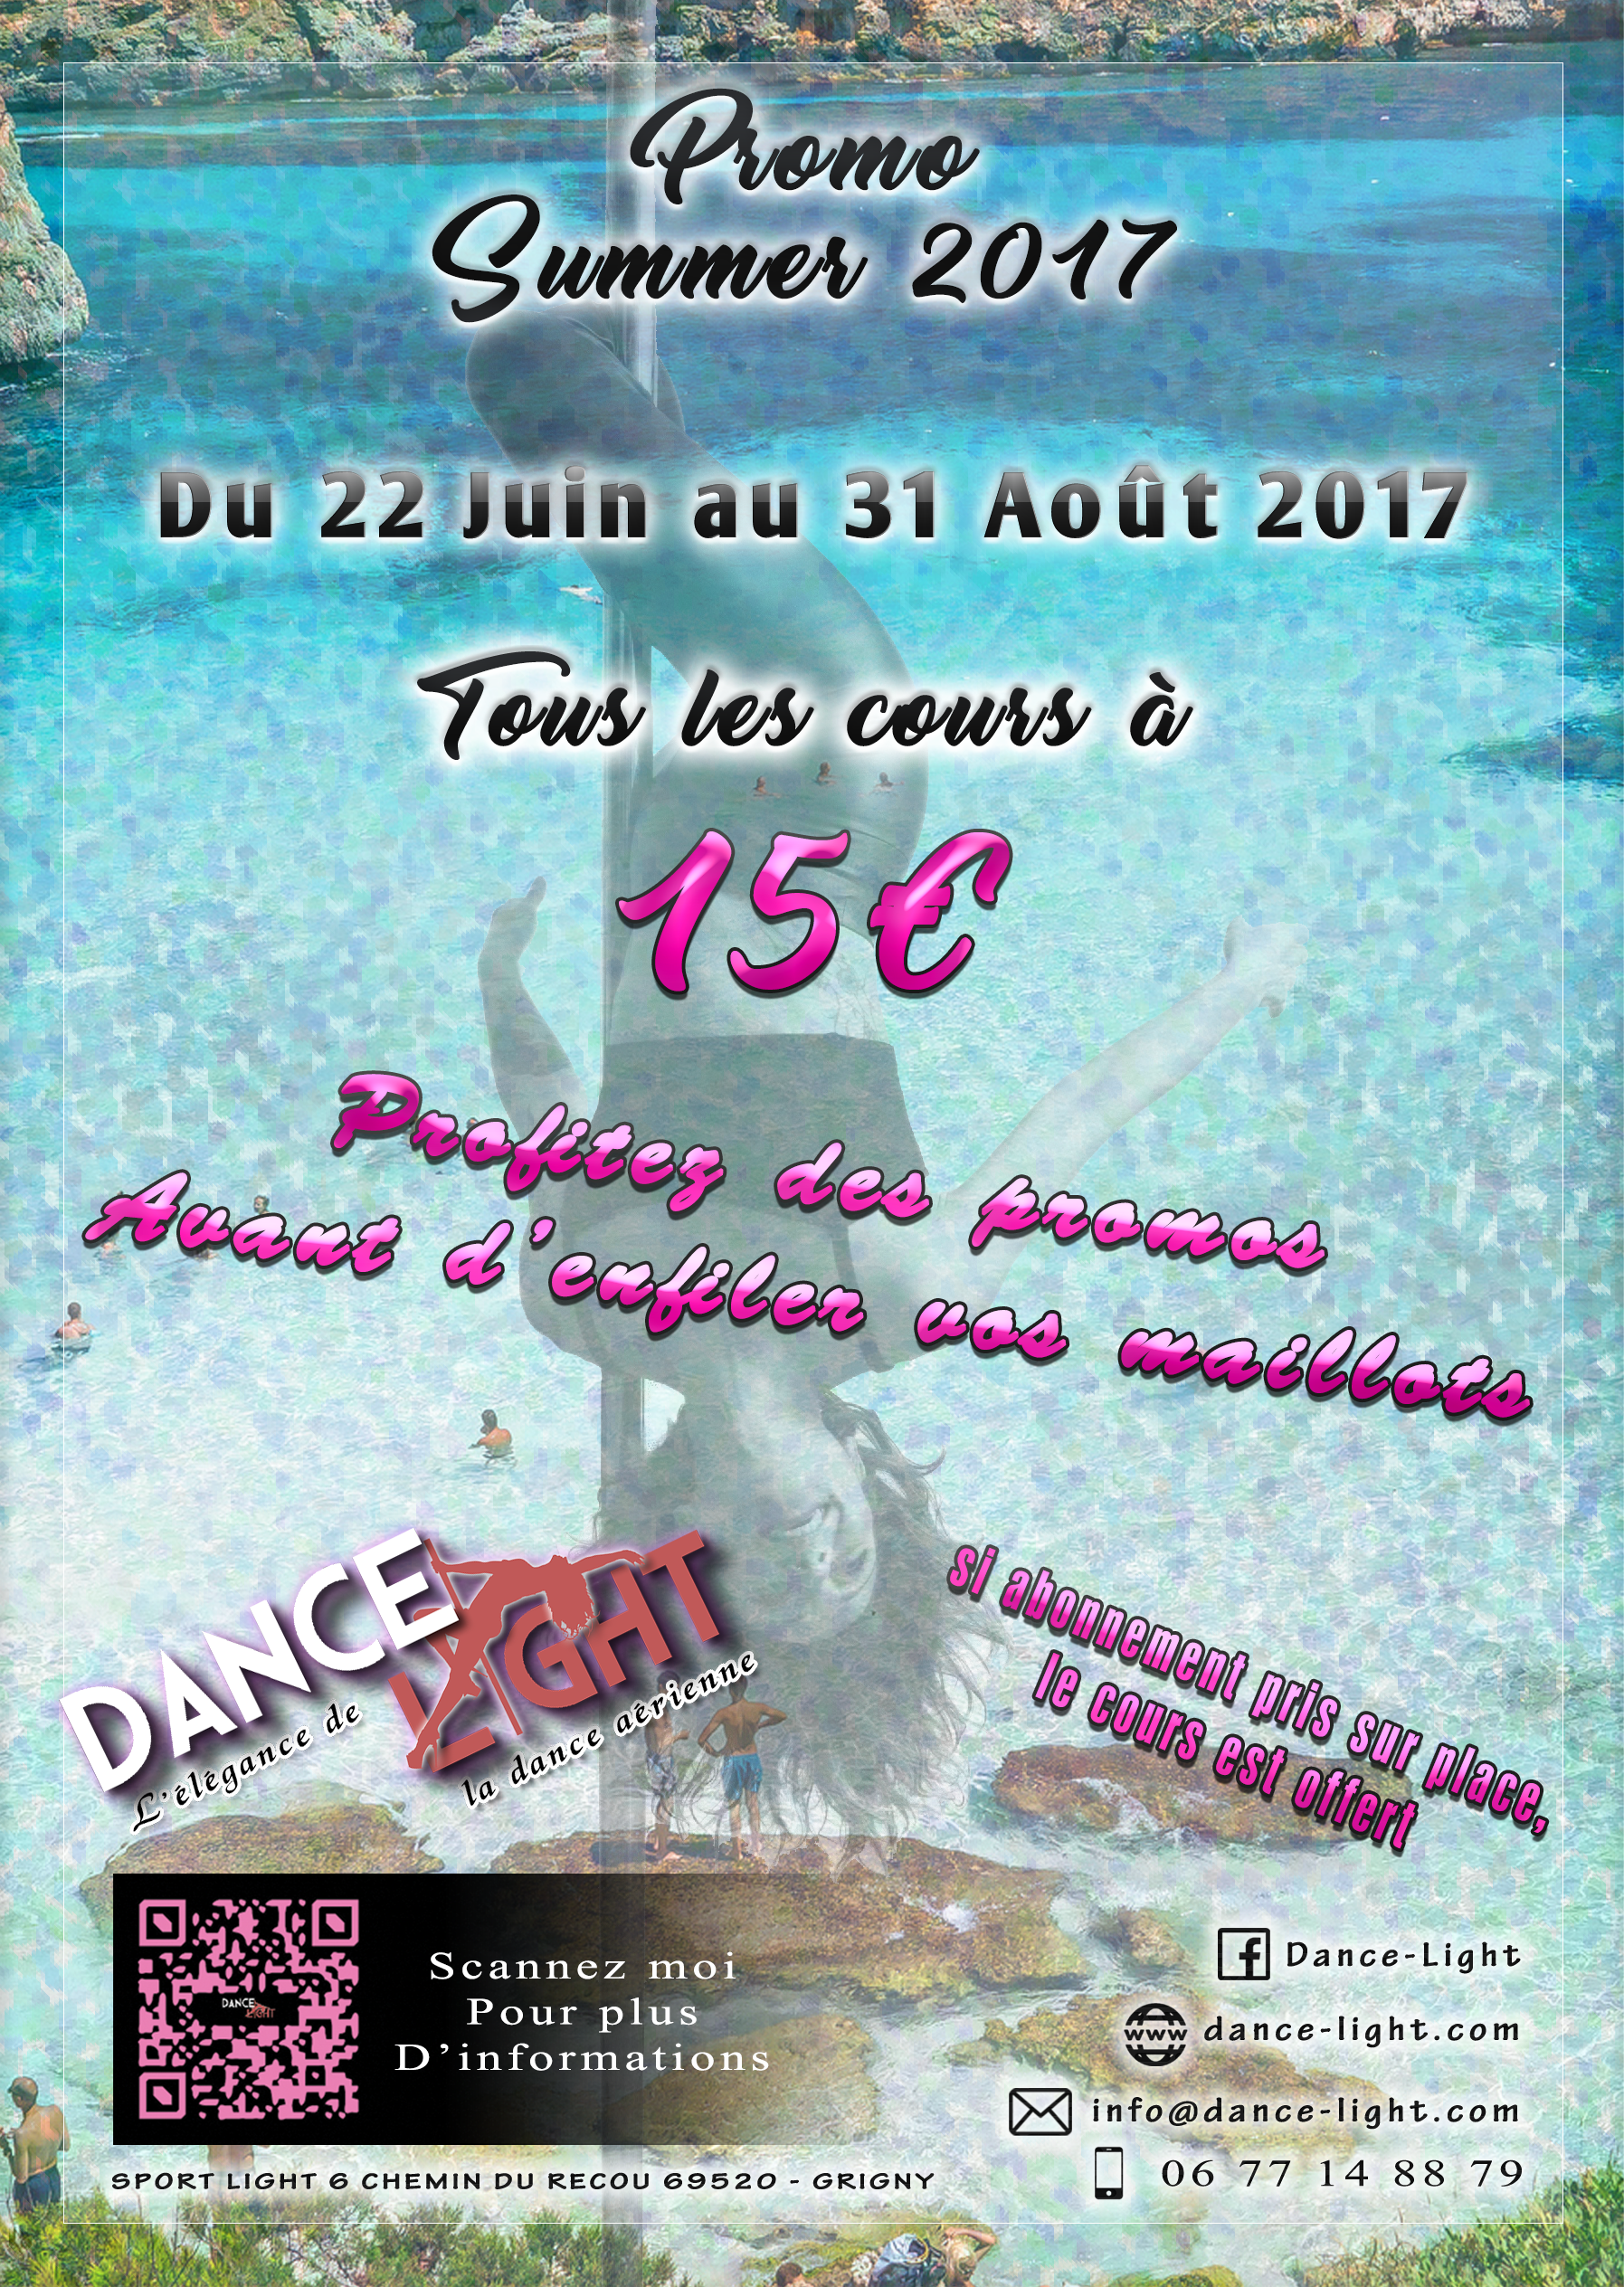 Promo summer 2017 - 2